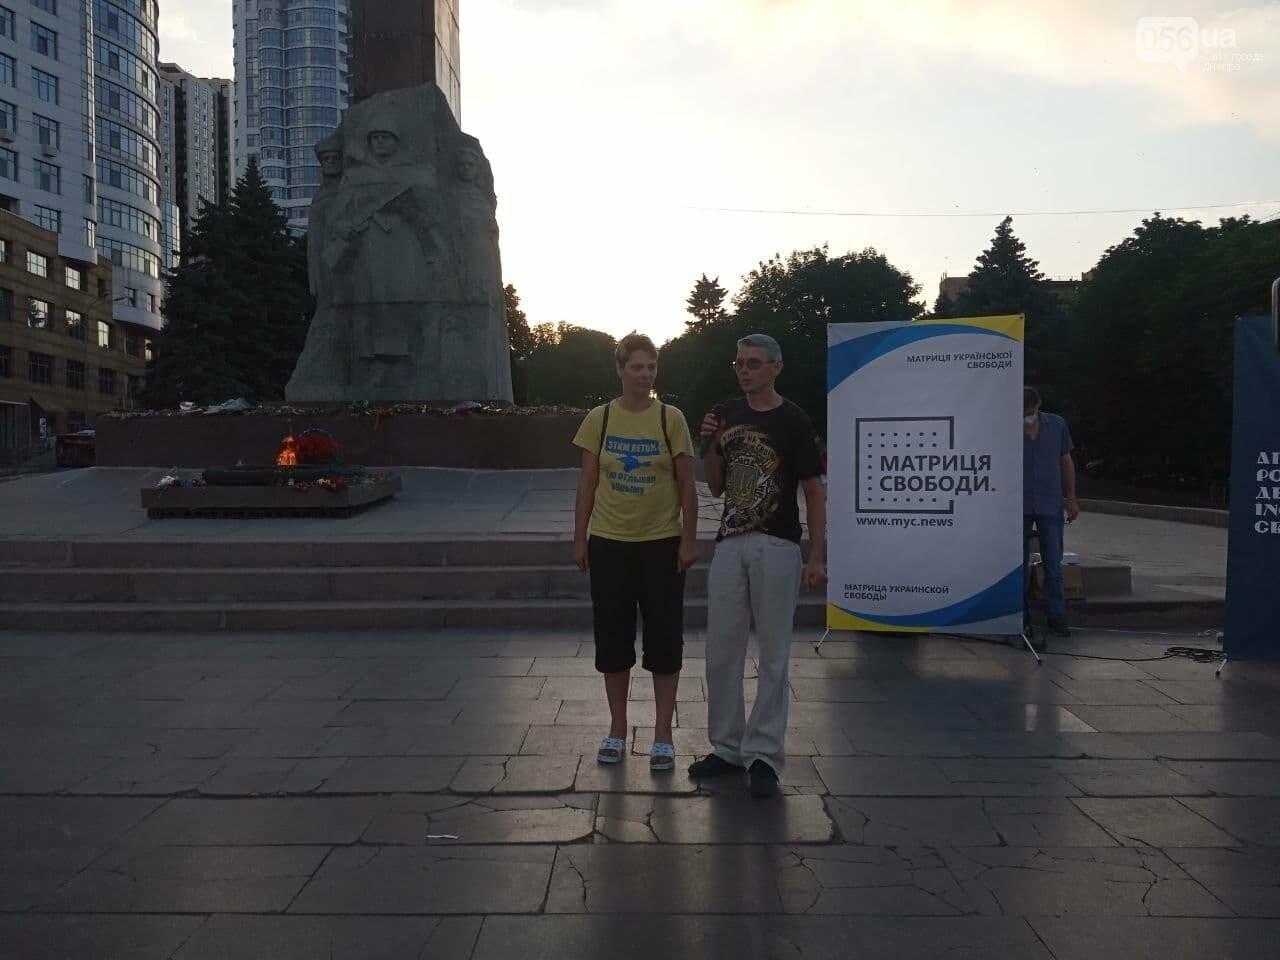 В Днепре активисты заявили, что победят Путина, - ФОТО, ВИДЕО, фото-11